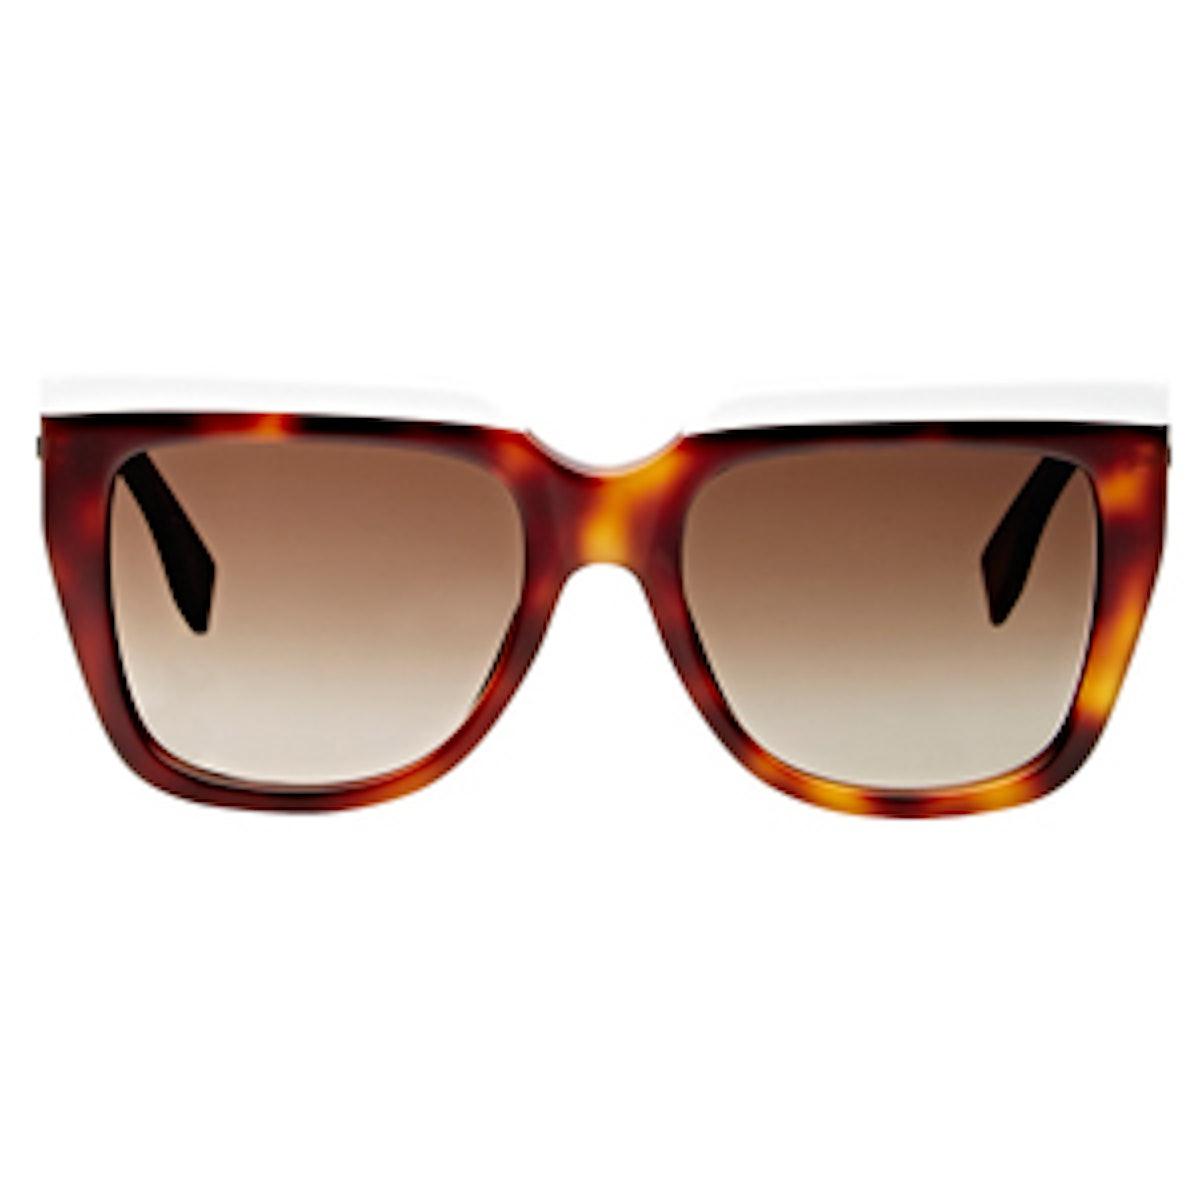 Colorblock Sunglasses